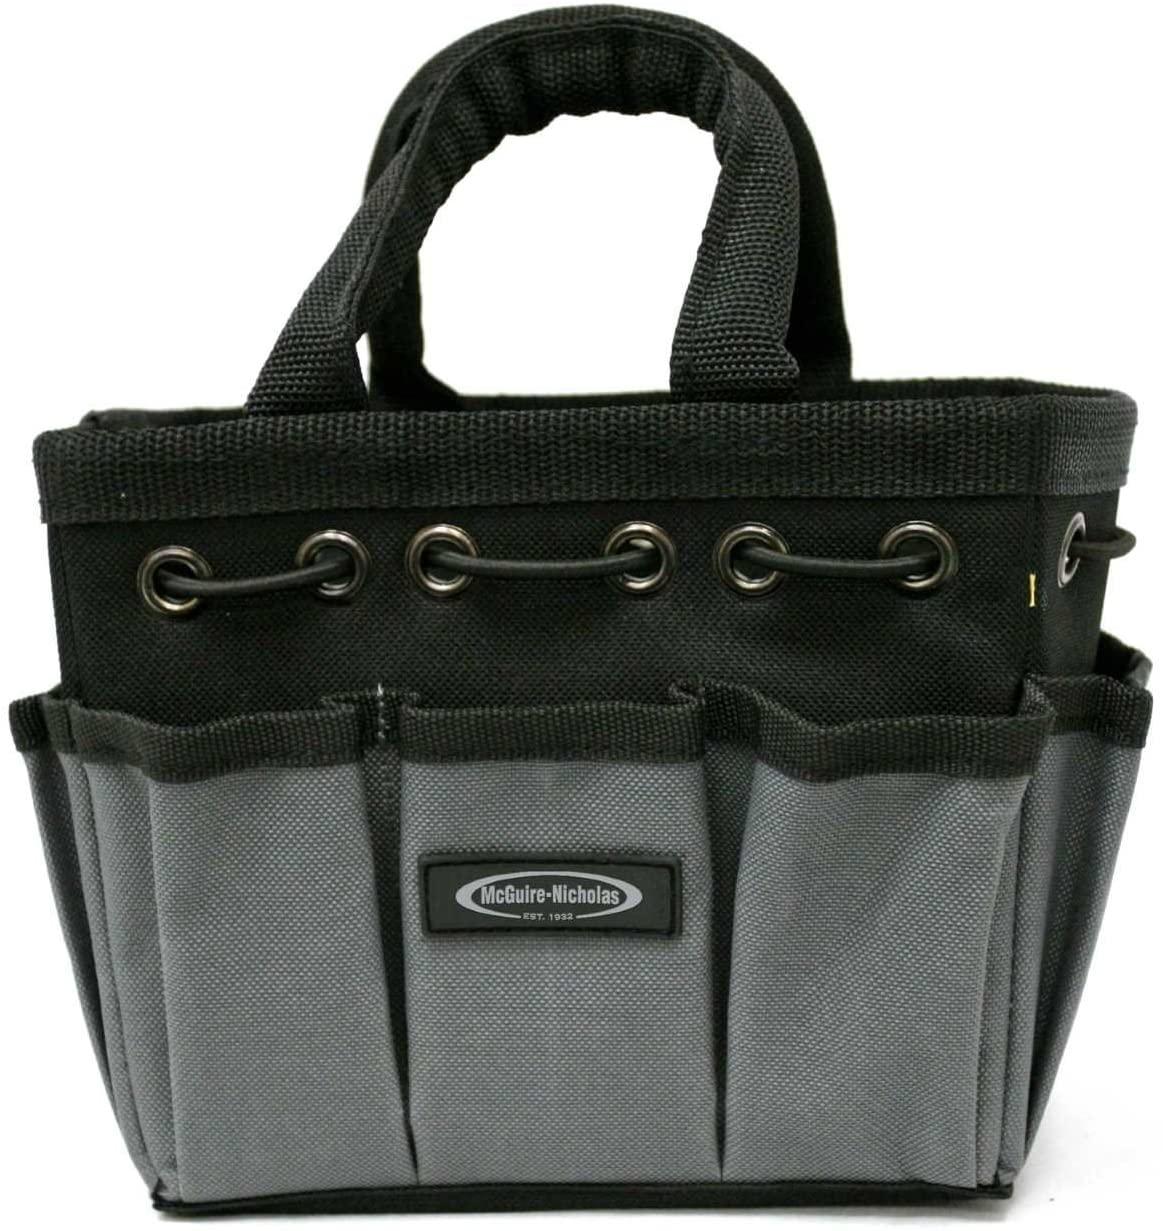 McGuire-Nicholas 22565-1 Mighty Bag Compact Tool Storage Tote, 7-Inch, Gray